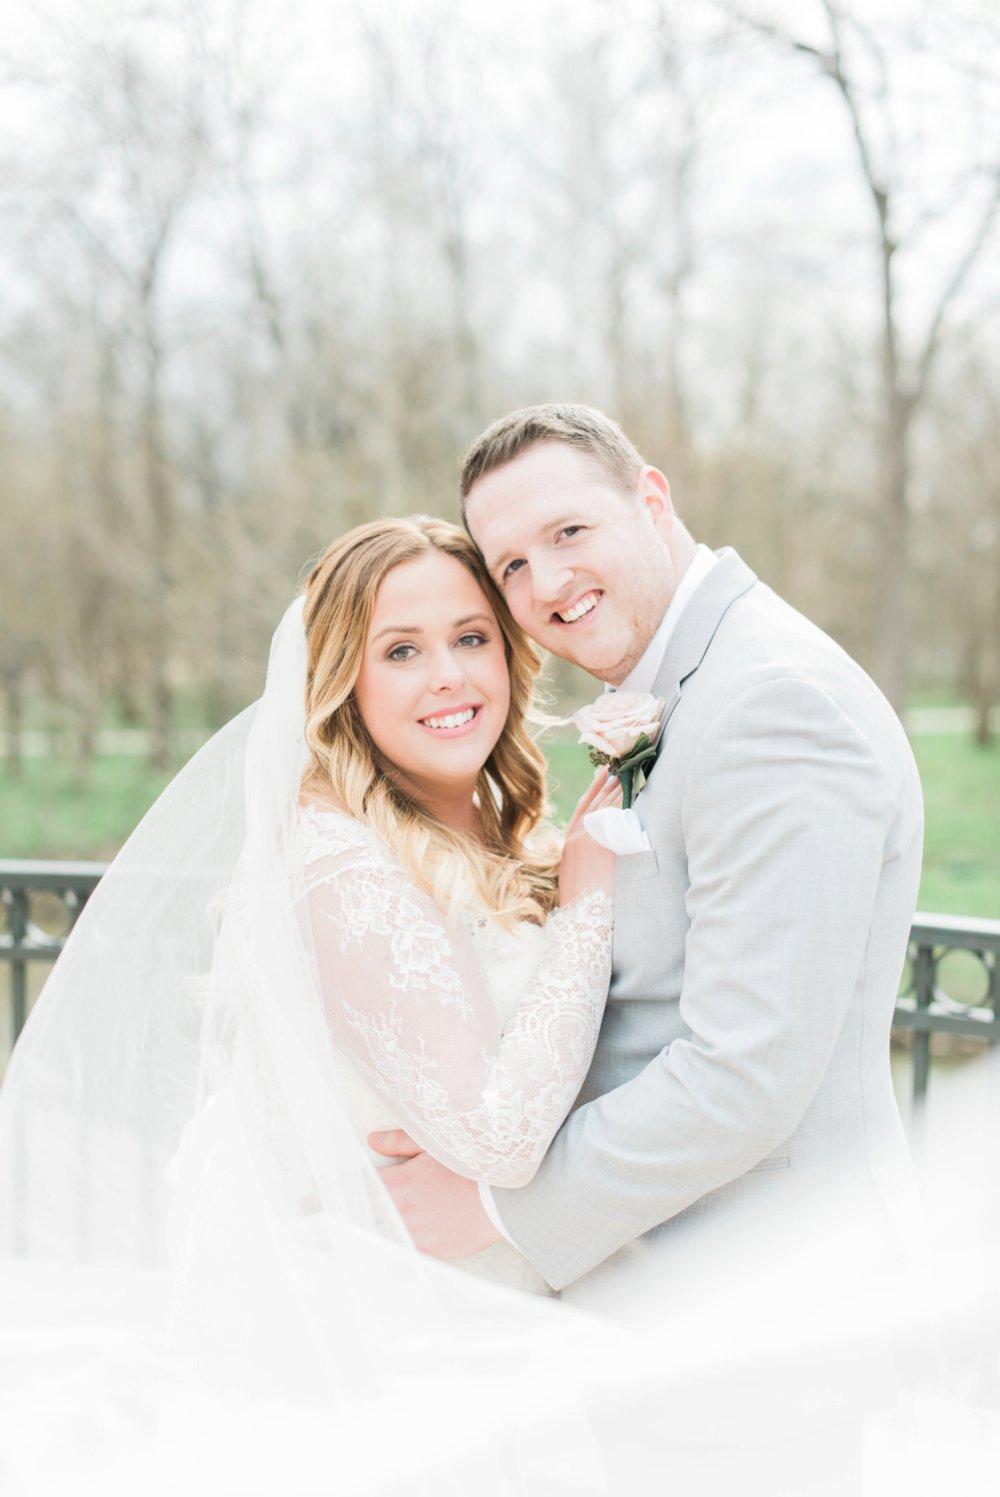 creekside-gahanna-ohio-wedding-melissa-matt_0089.jpg